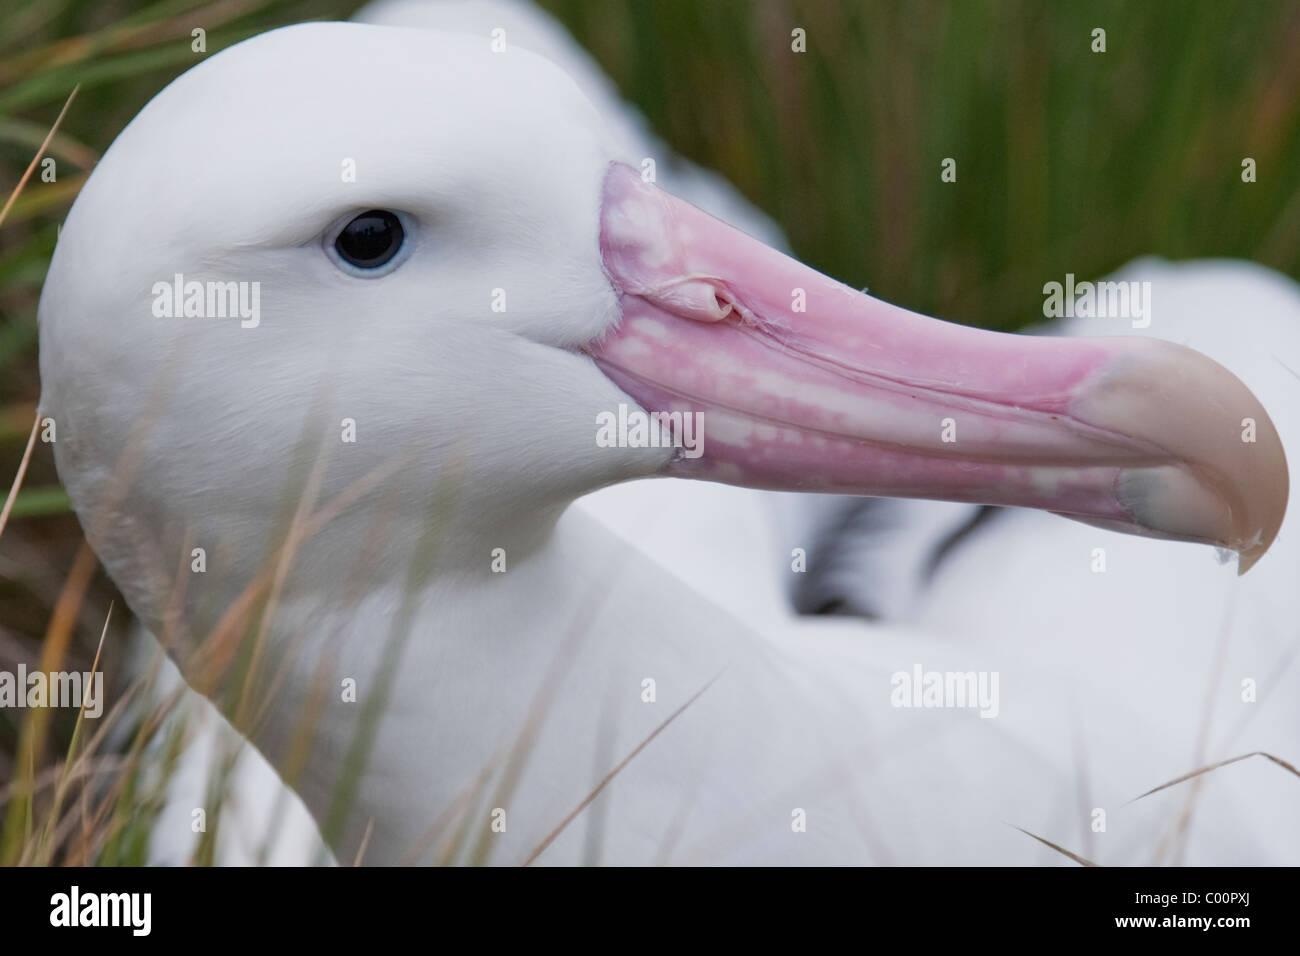 Wondering Albatross (Diomedea exulans) portrait of adult bird. South Georgia, South Atlantic Ocean. - Stock Image